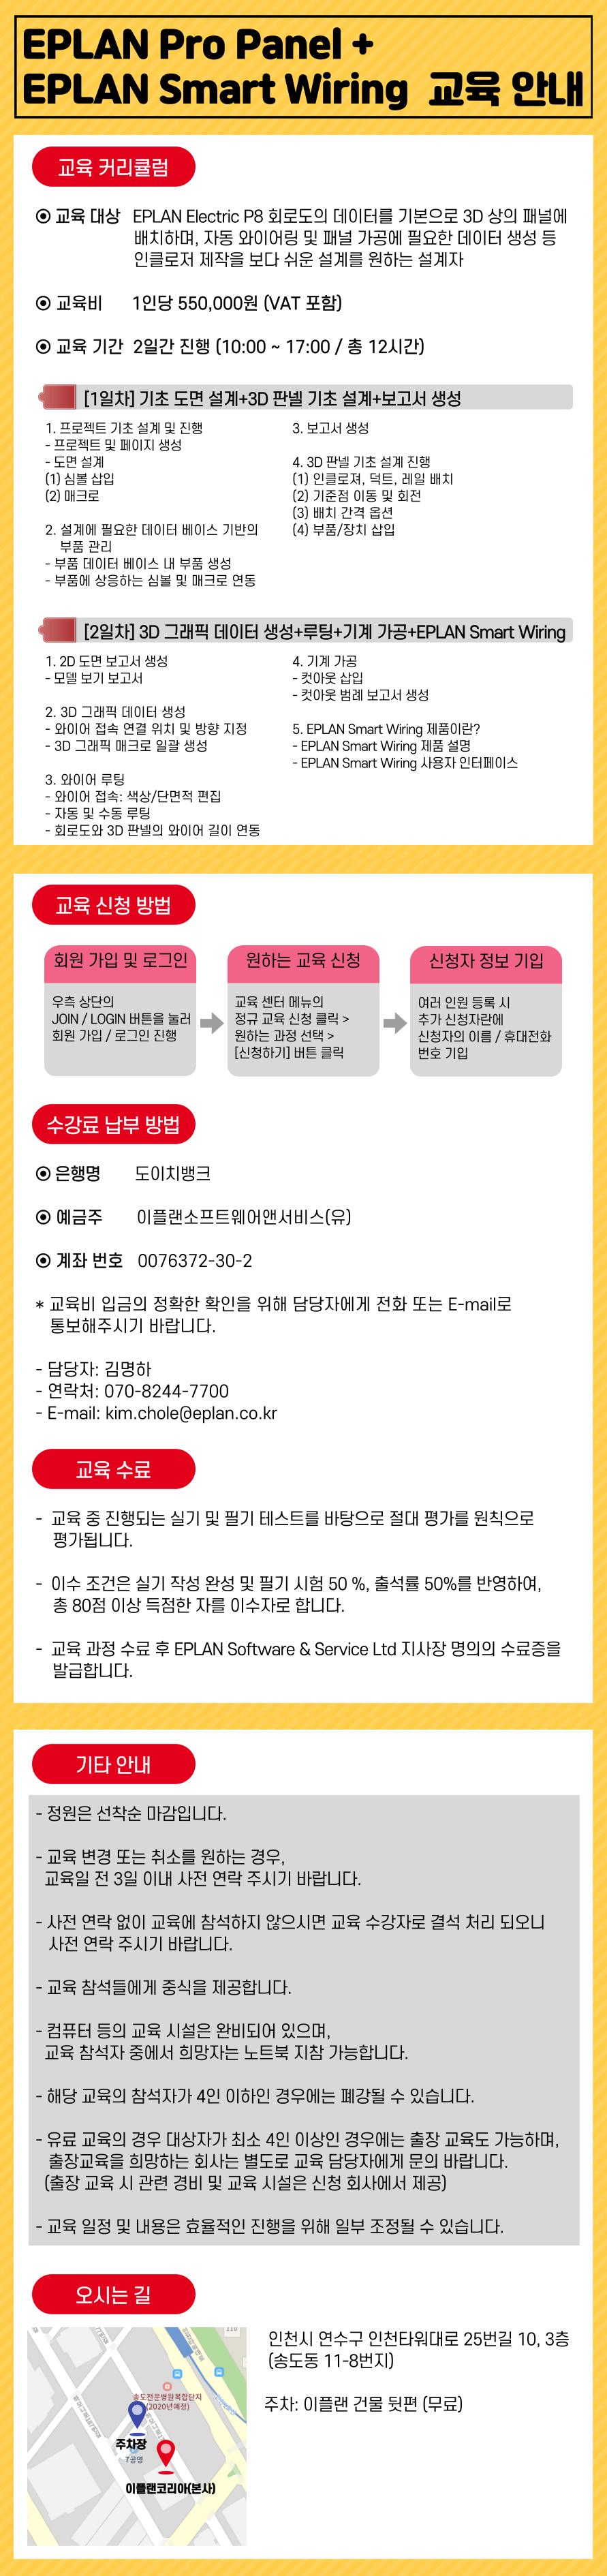 Pro-Panel-Smart-Wiring-송도-교육-안내.png